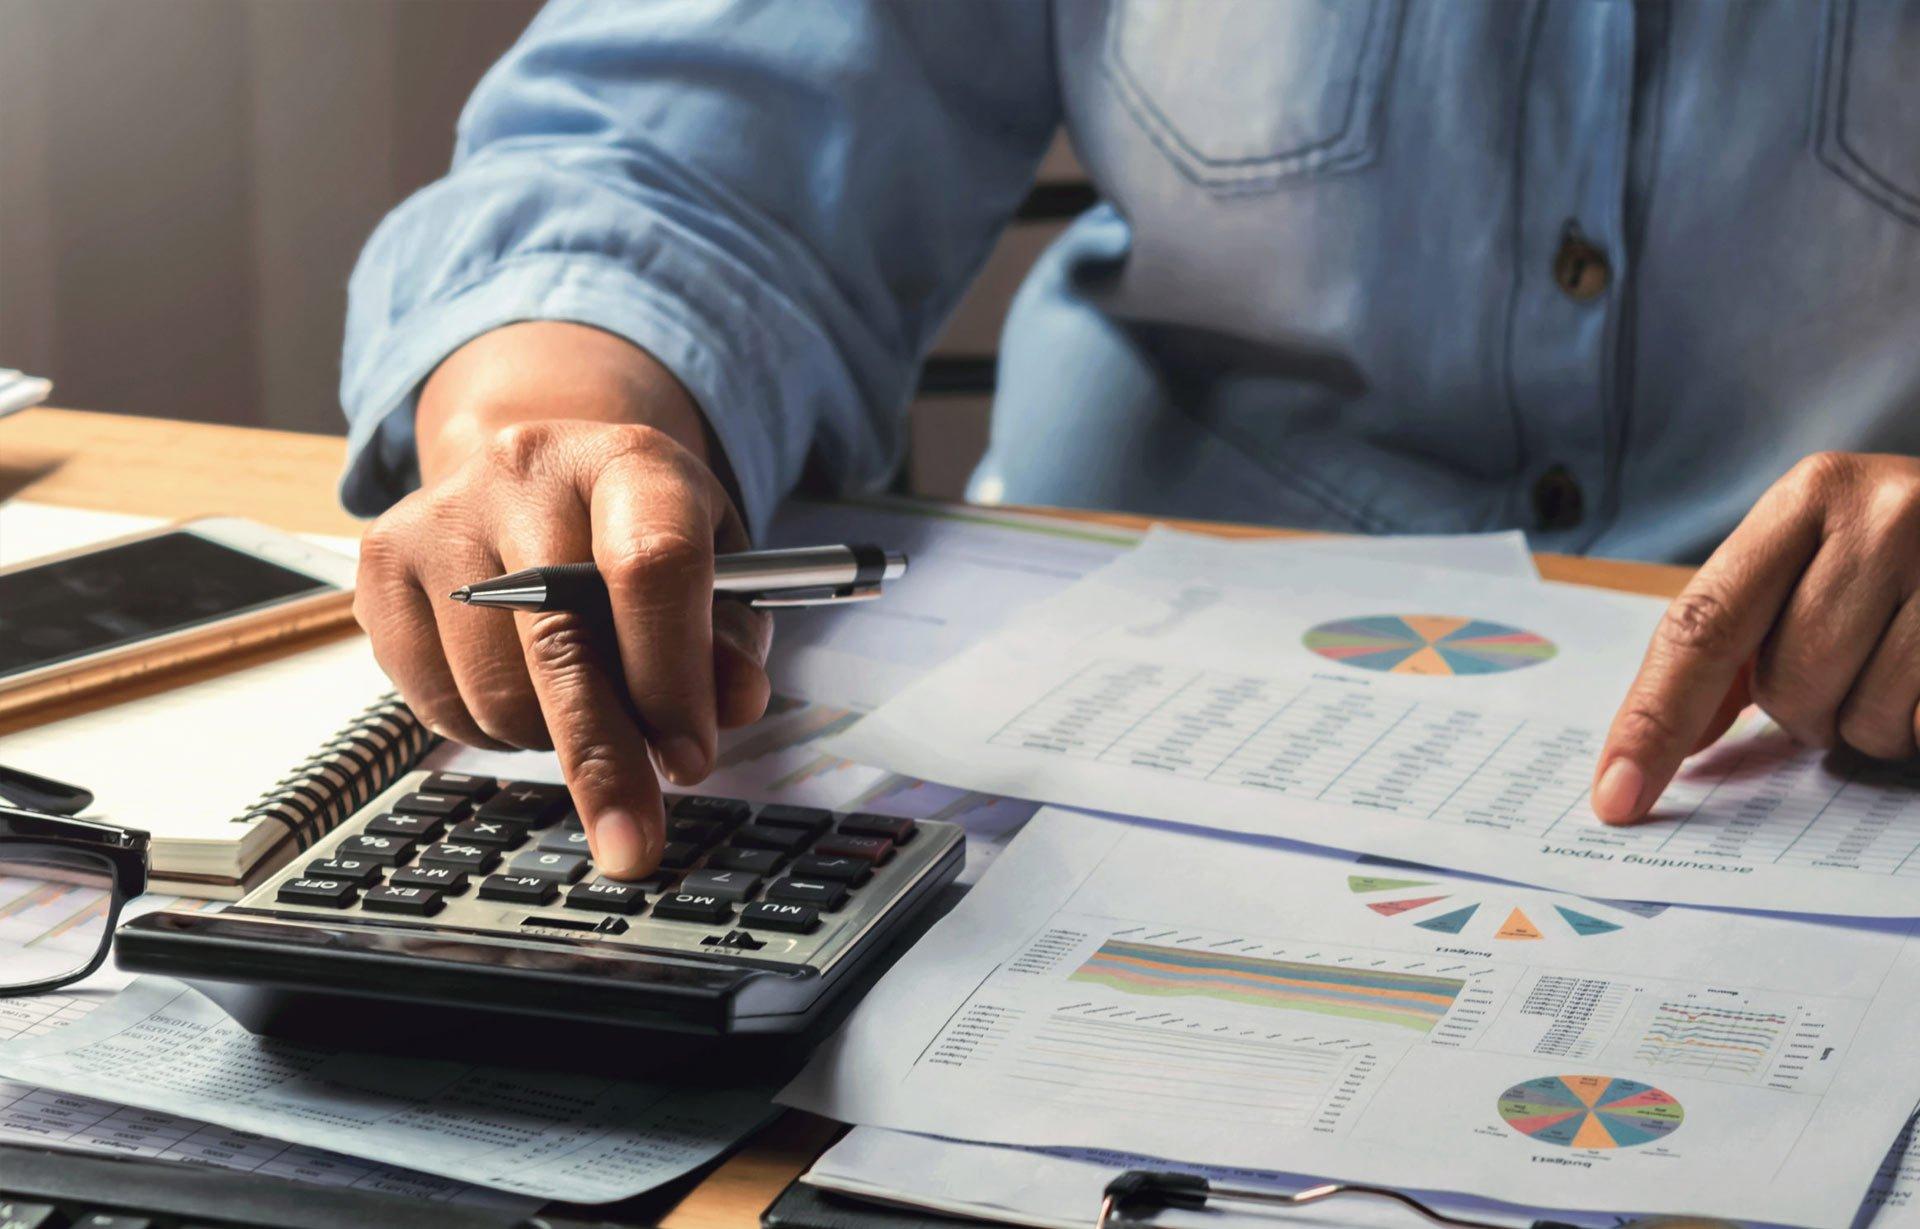 man doing accounting work using calculator